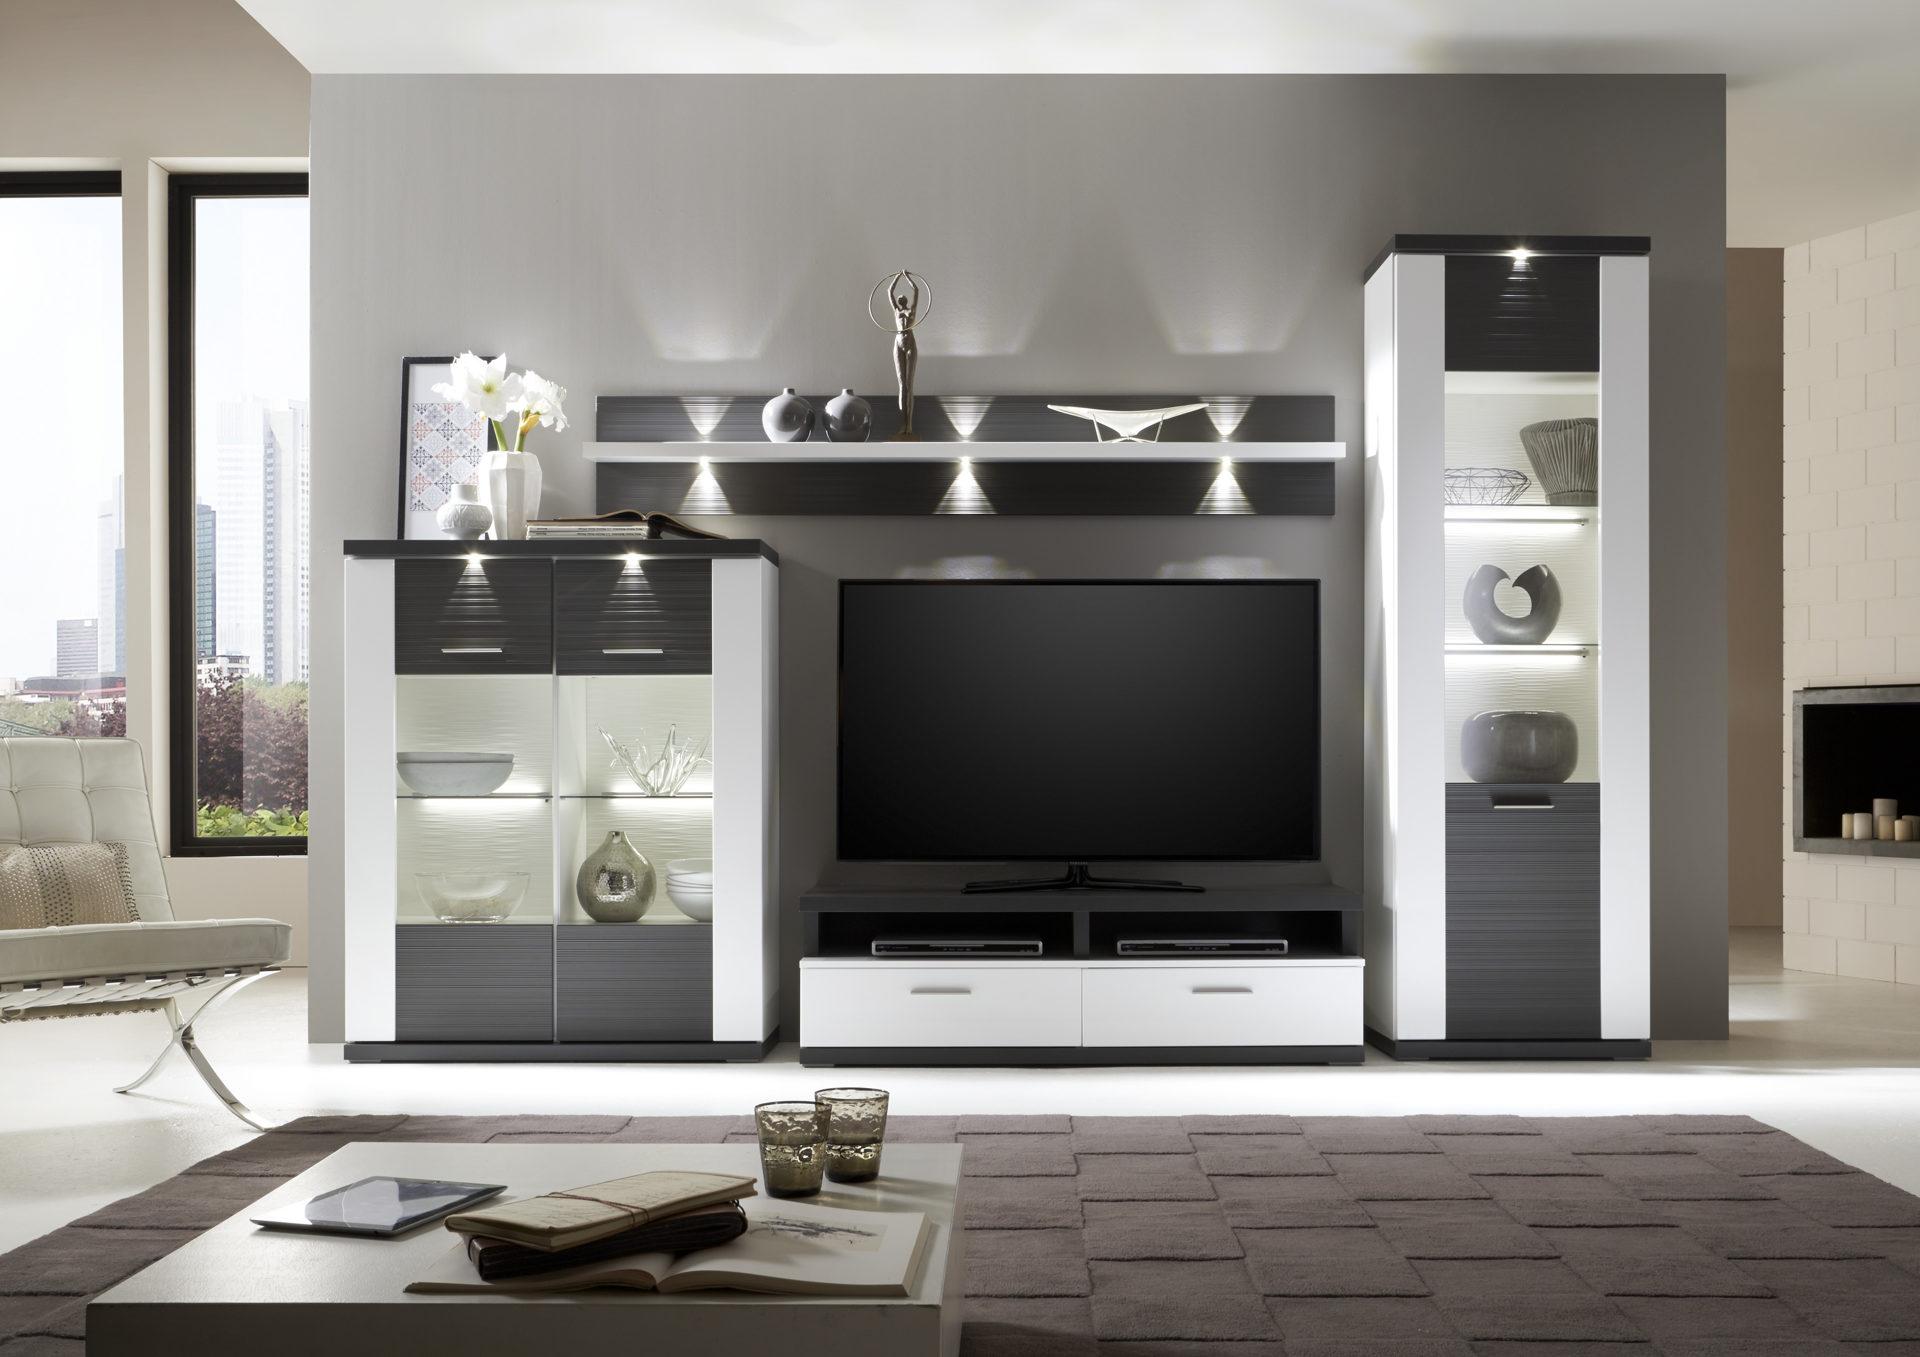 Wohnkombination Wohnwand Mit Tv Mobel Graphitfarbene